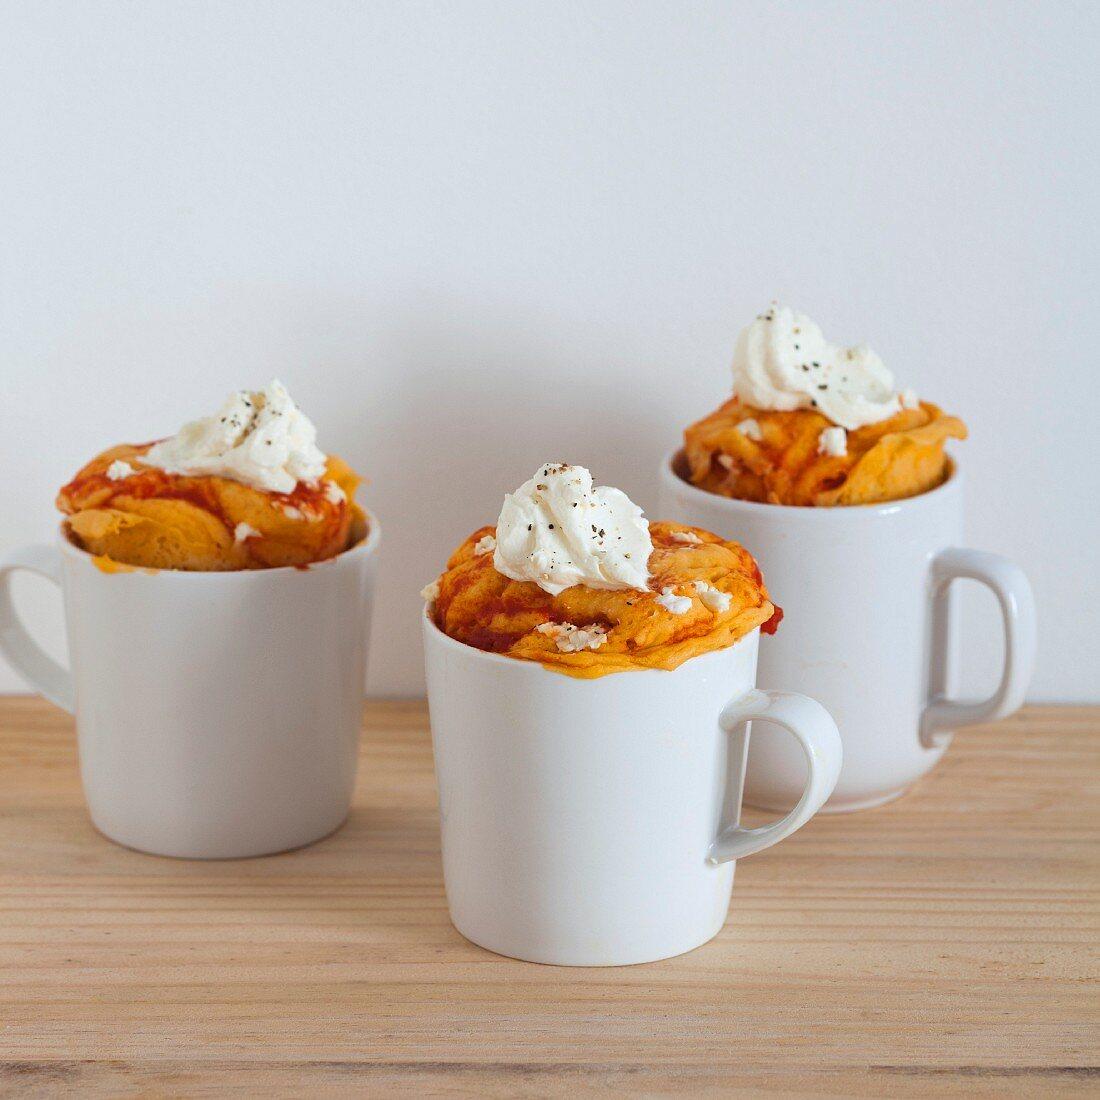 Savoury mug cakes with cream cheese and tomato sauce